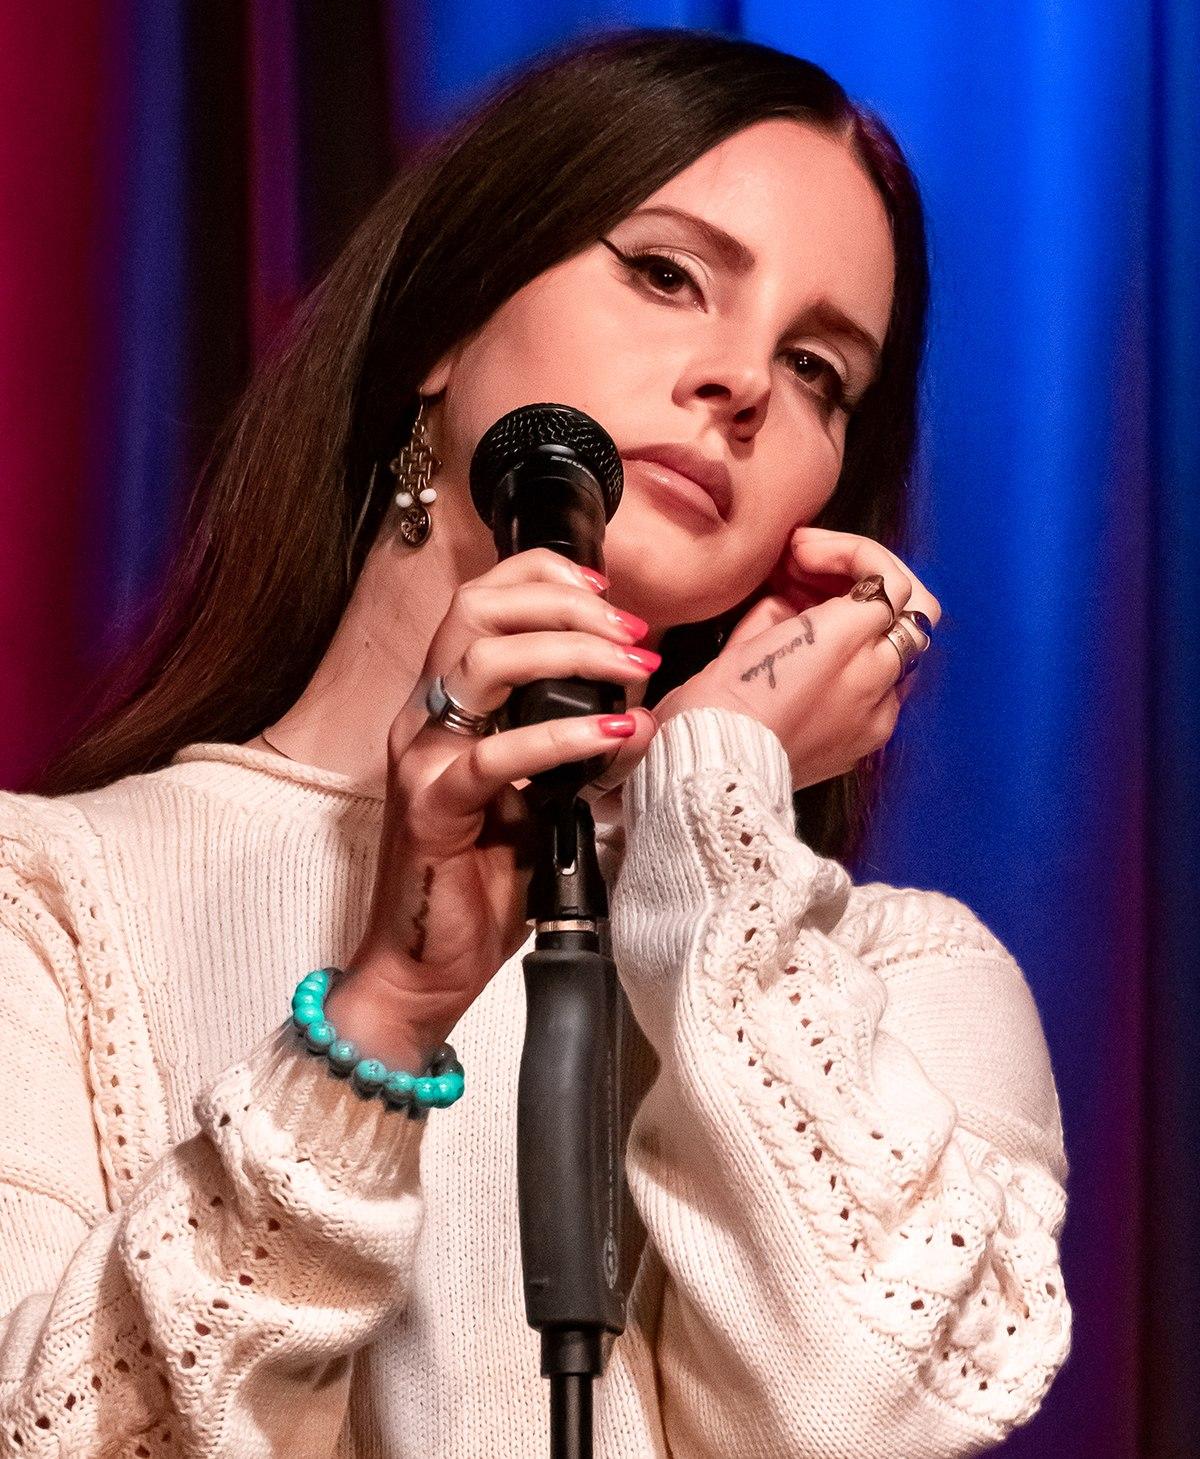 Lana Del Rey Wikipedia